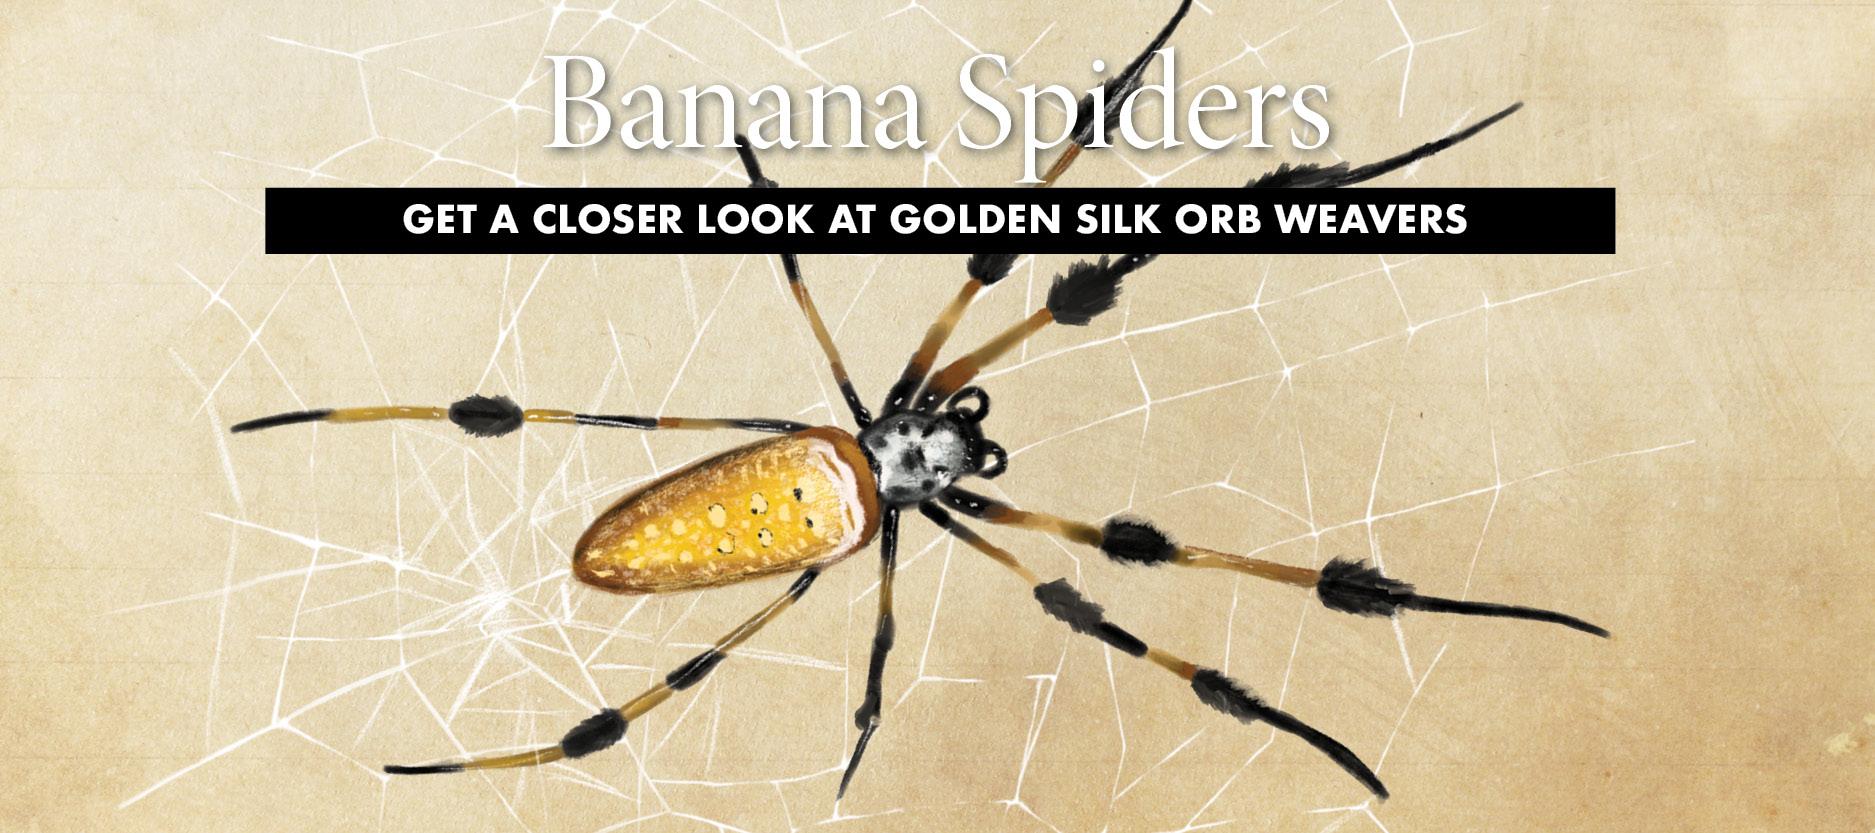 So Charleston Banana Spider